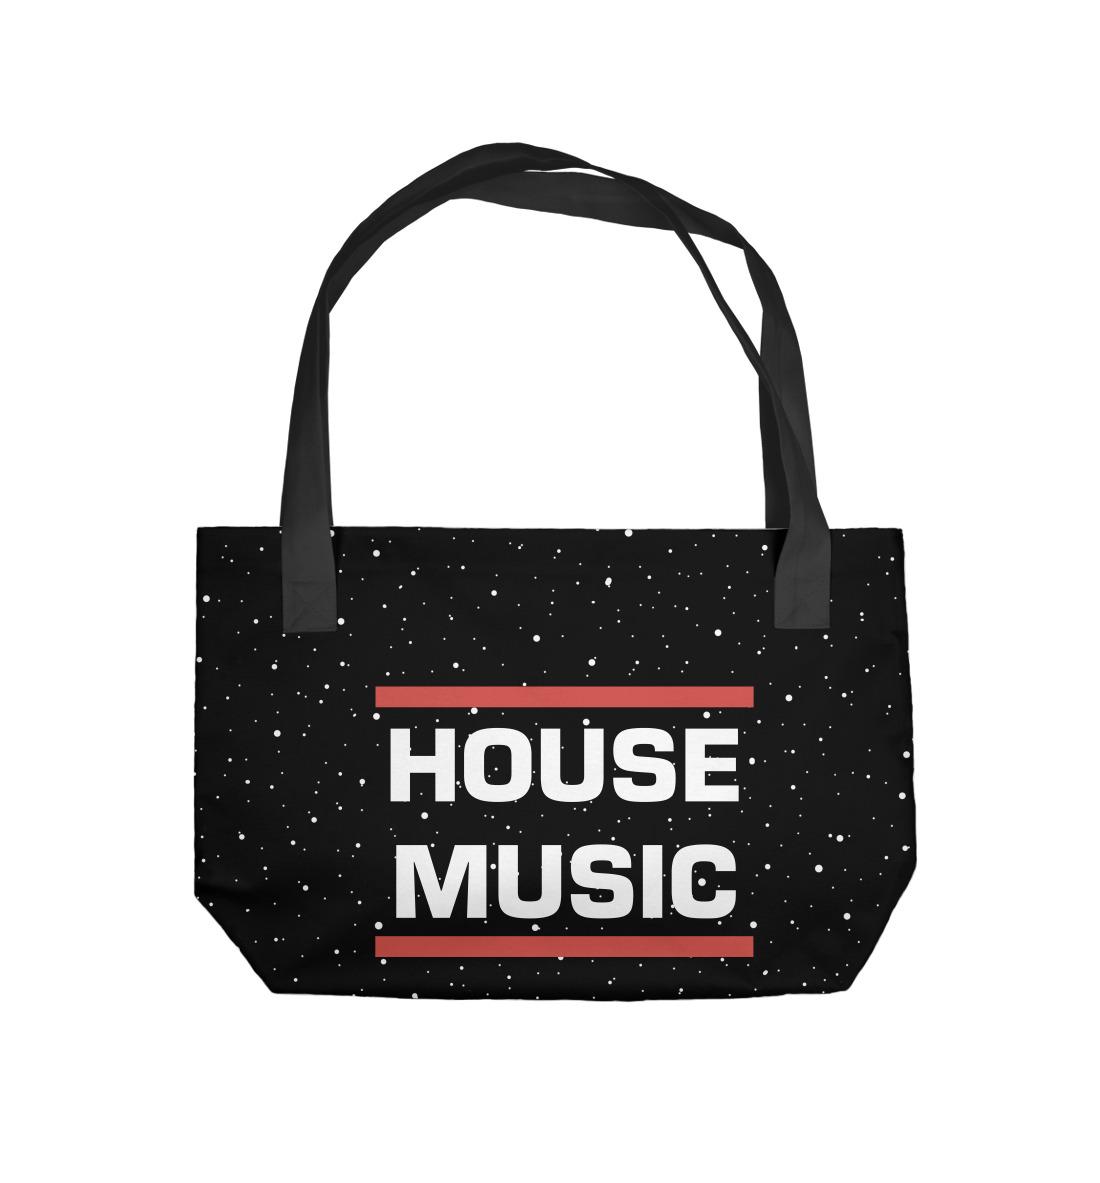 House music mikael niemi popular music